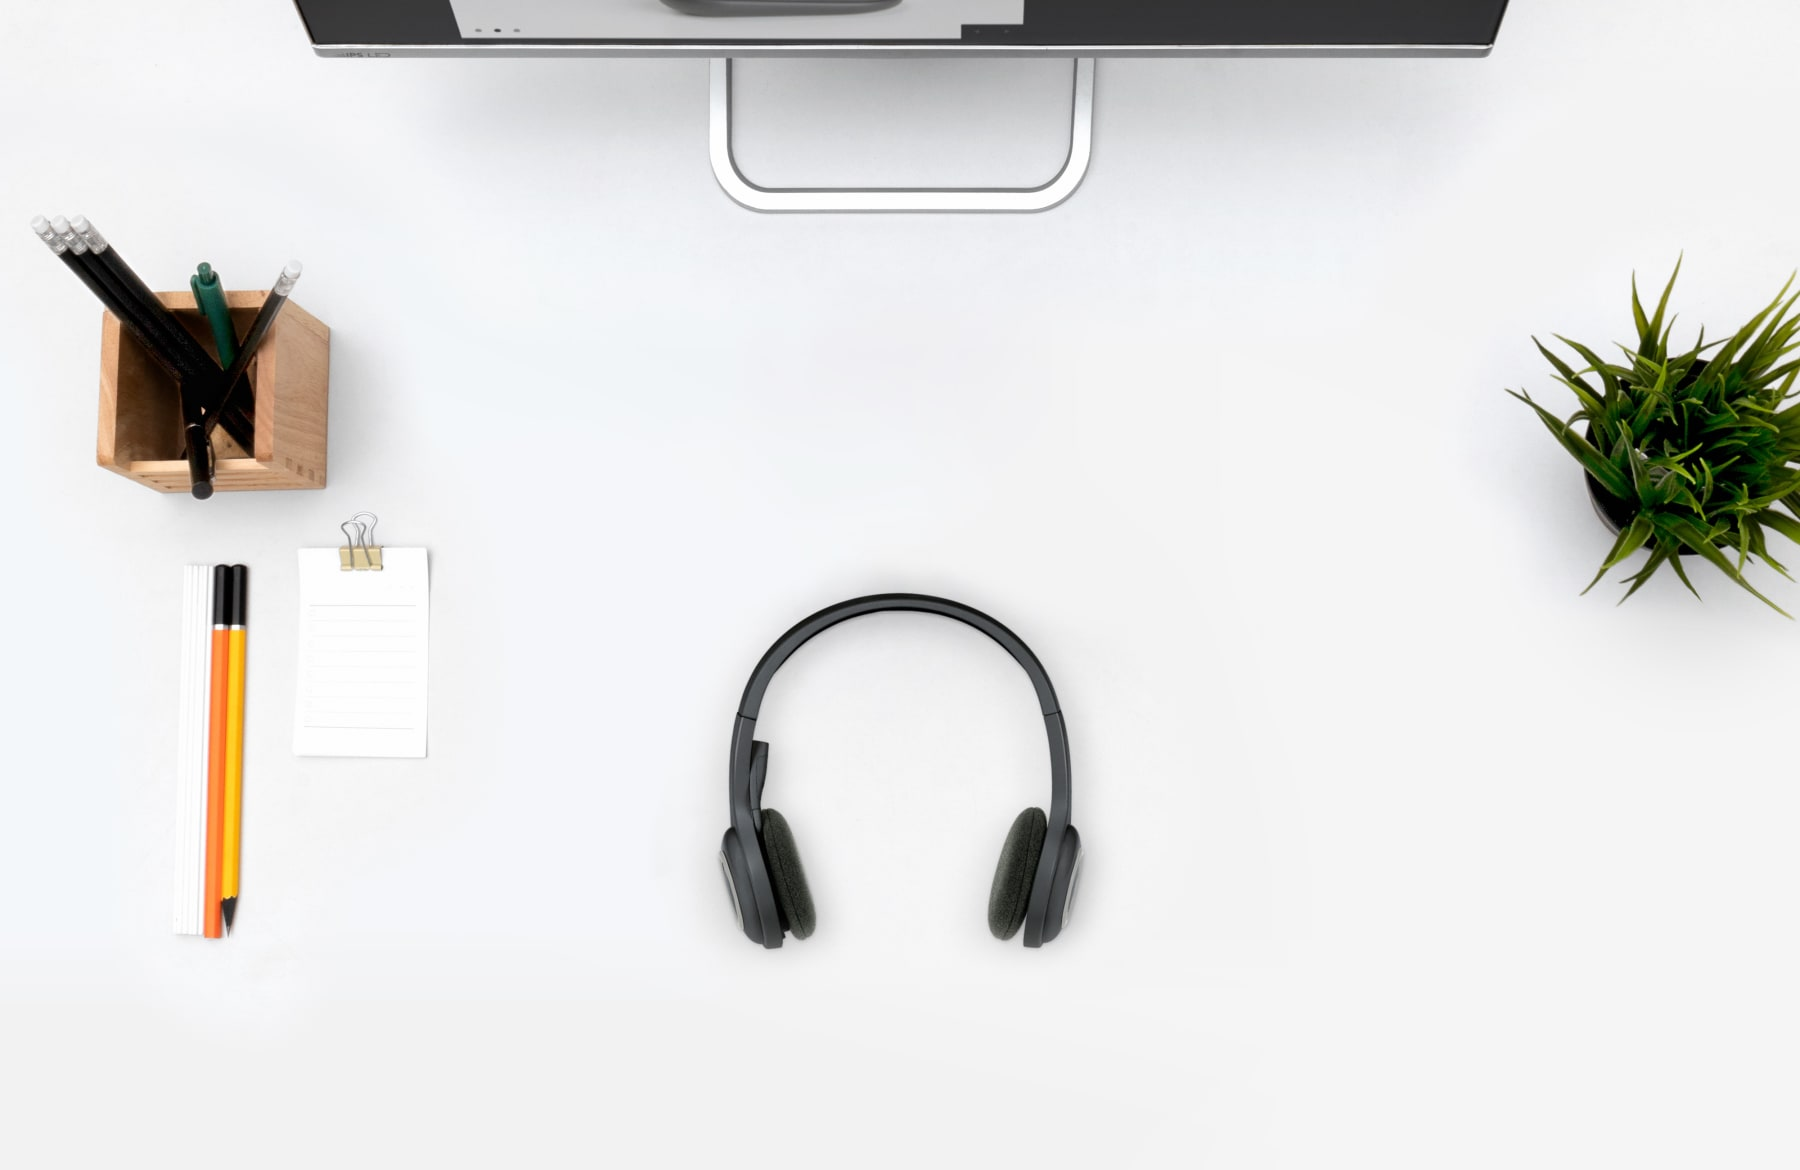 https://resource.logitech.com/w_1800,h_1800,c_limit,q_auto,f_auto,dpr_1.0/content/dam/logitech/en/products/headsets/h600-wireless-headset/h600-hero-banner-02.jpg?v=1